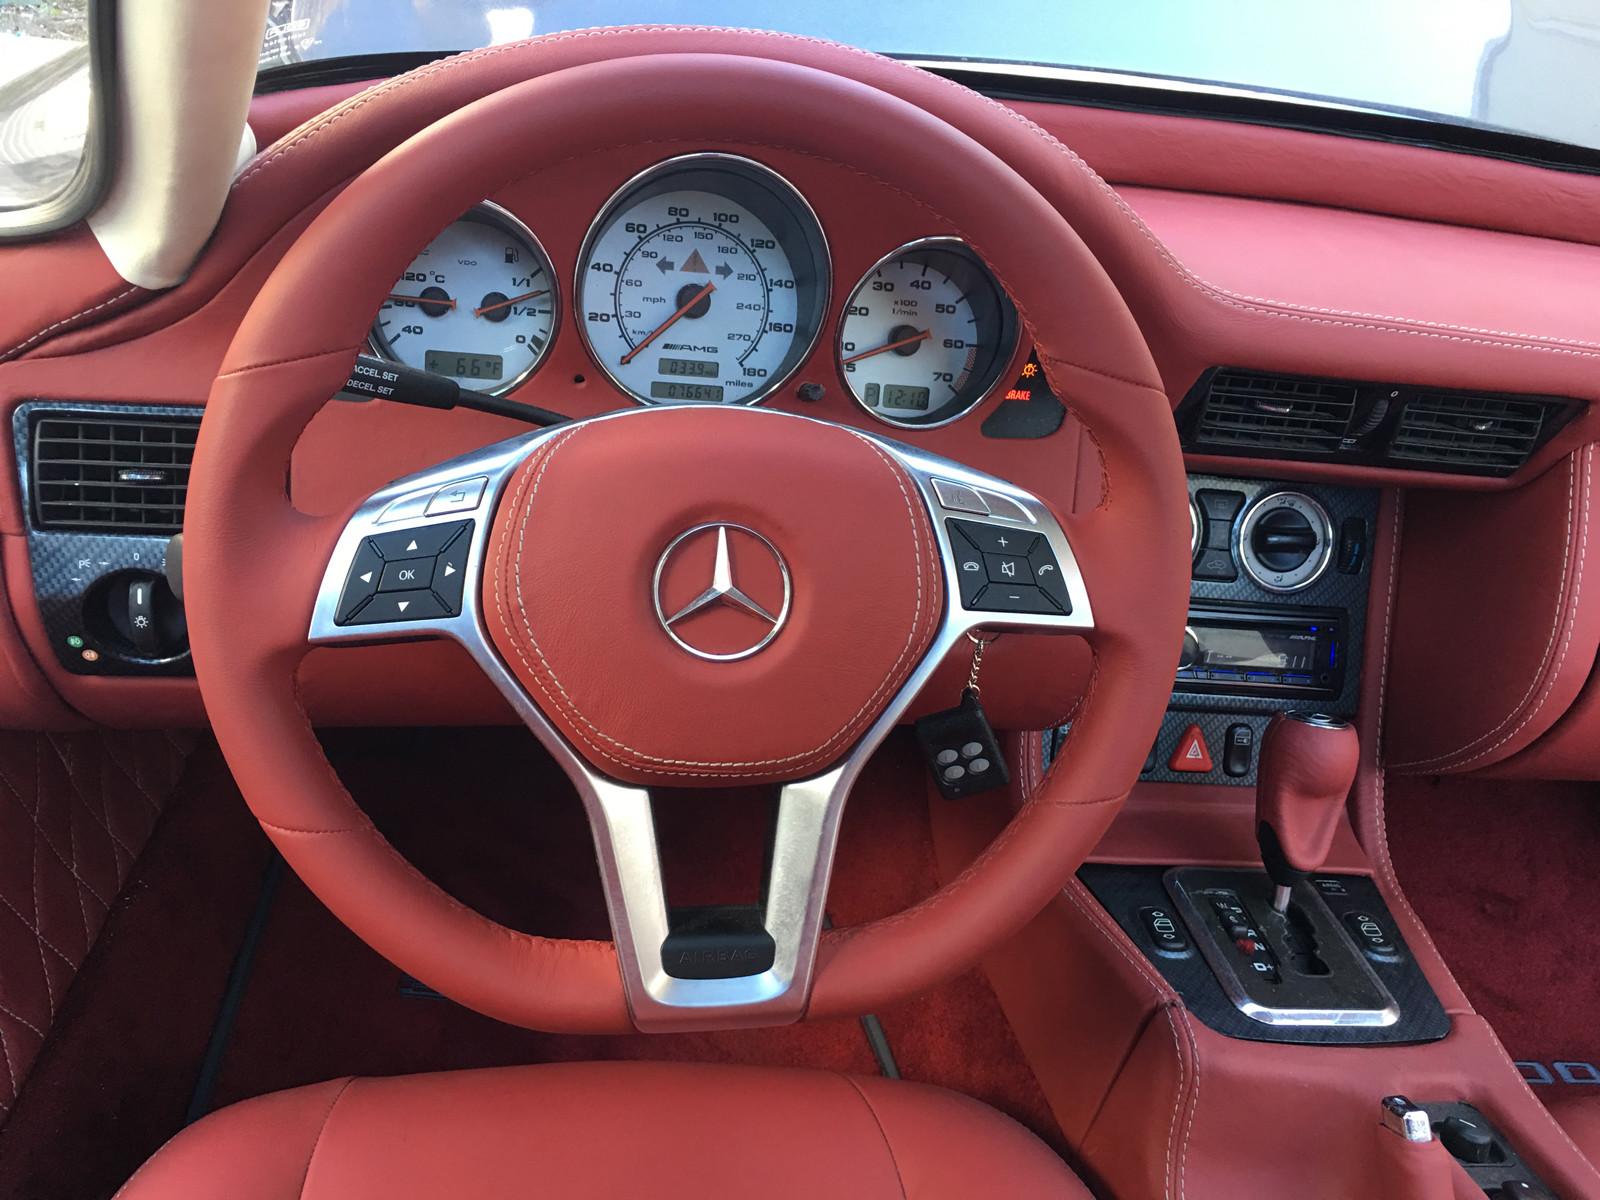 Foto de Réplica Mercedes-Benz 300 SL Gullwing base SLK AMG (2/10)